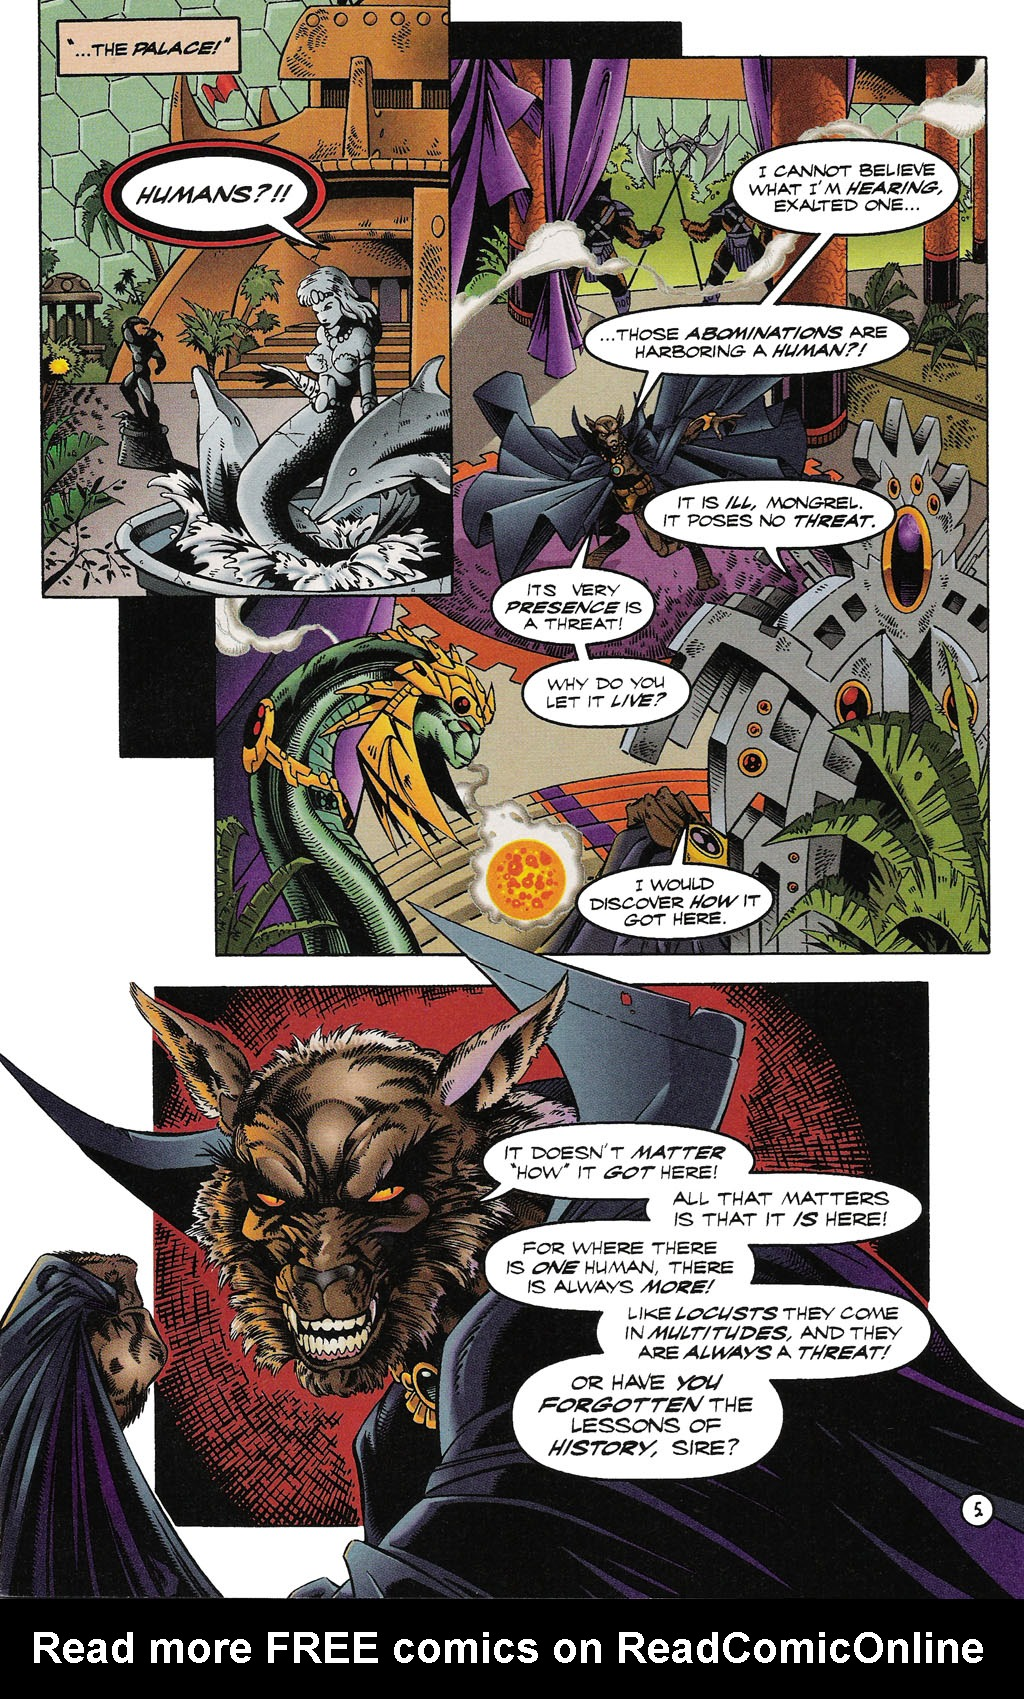 Read online ShadowHawk comic -  Issue #15 - 6